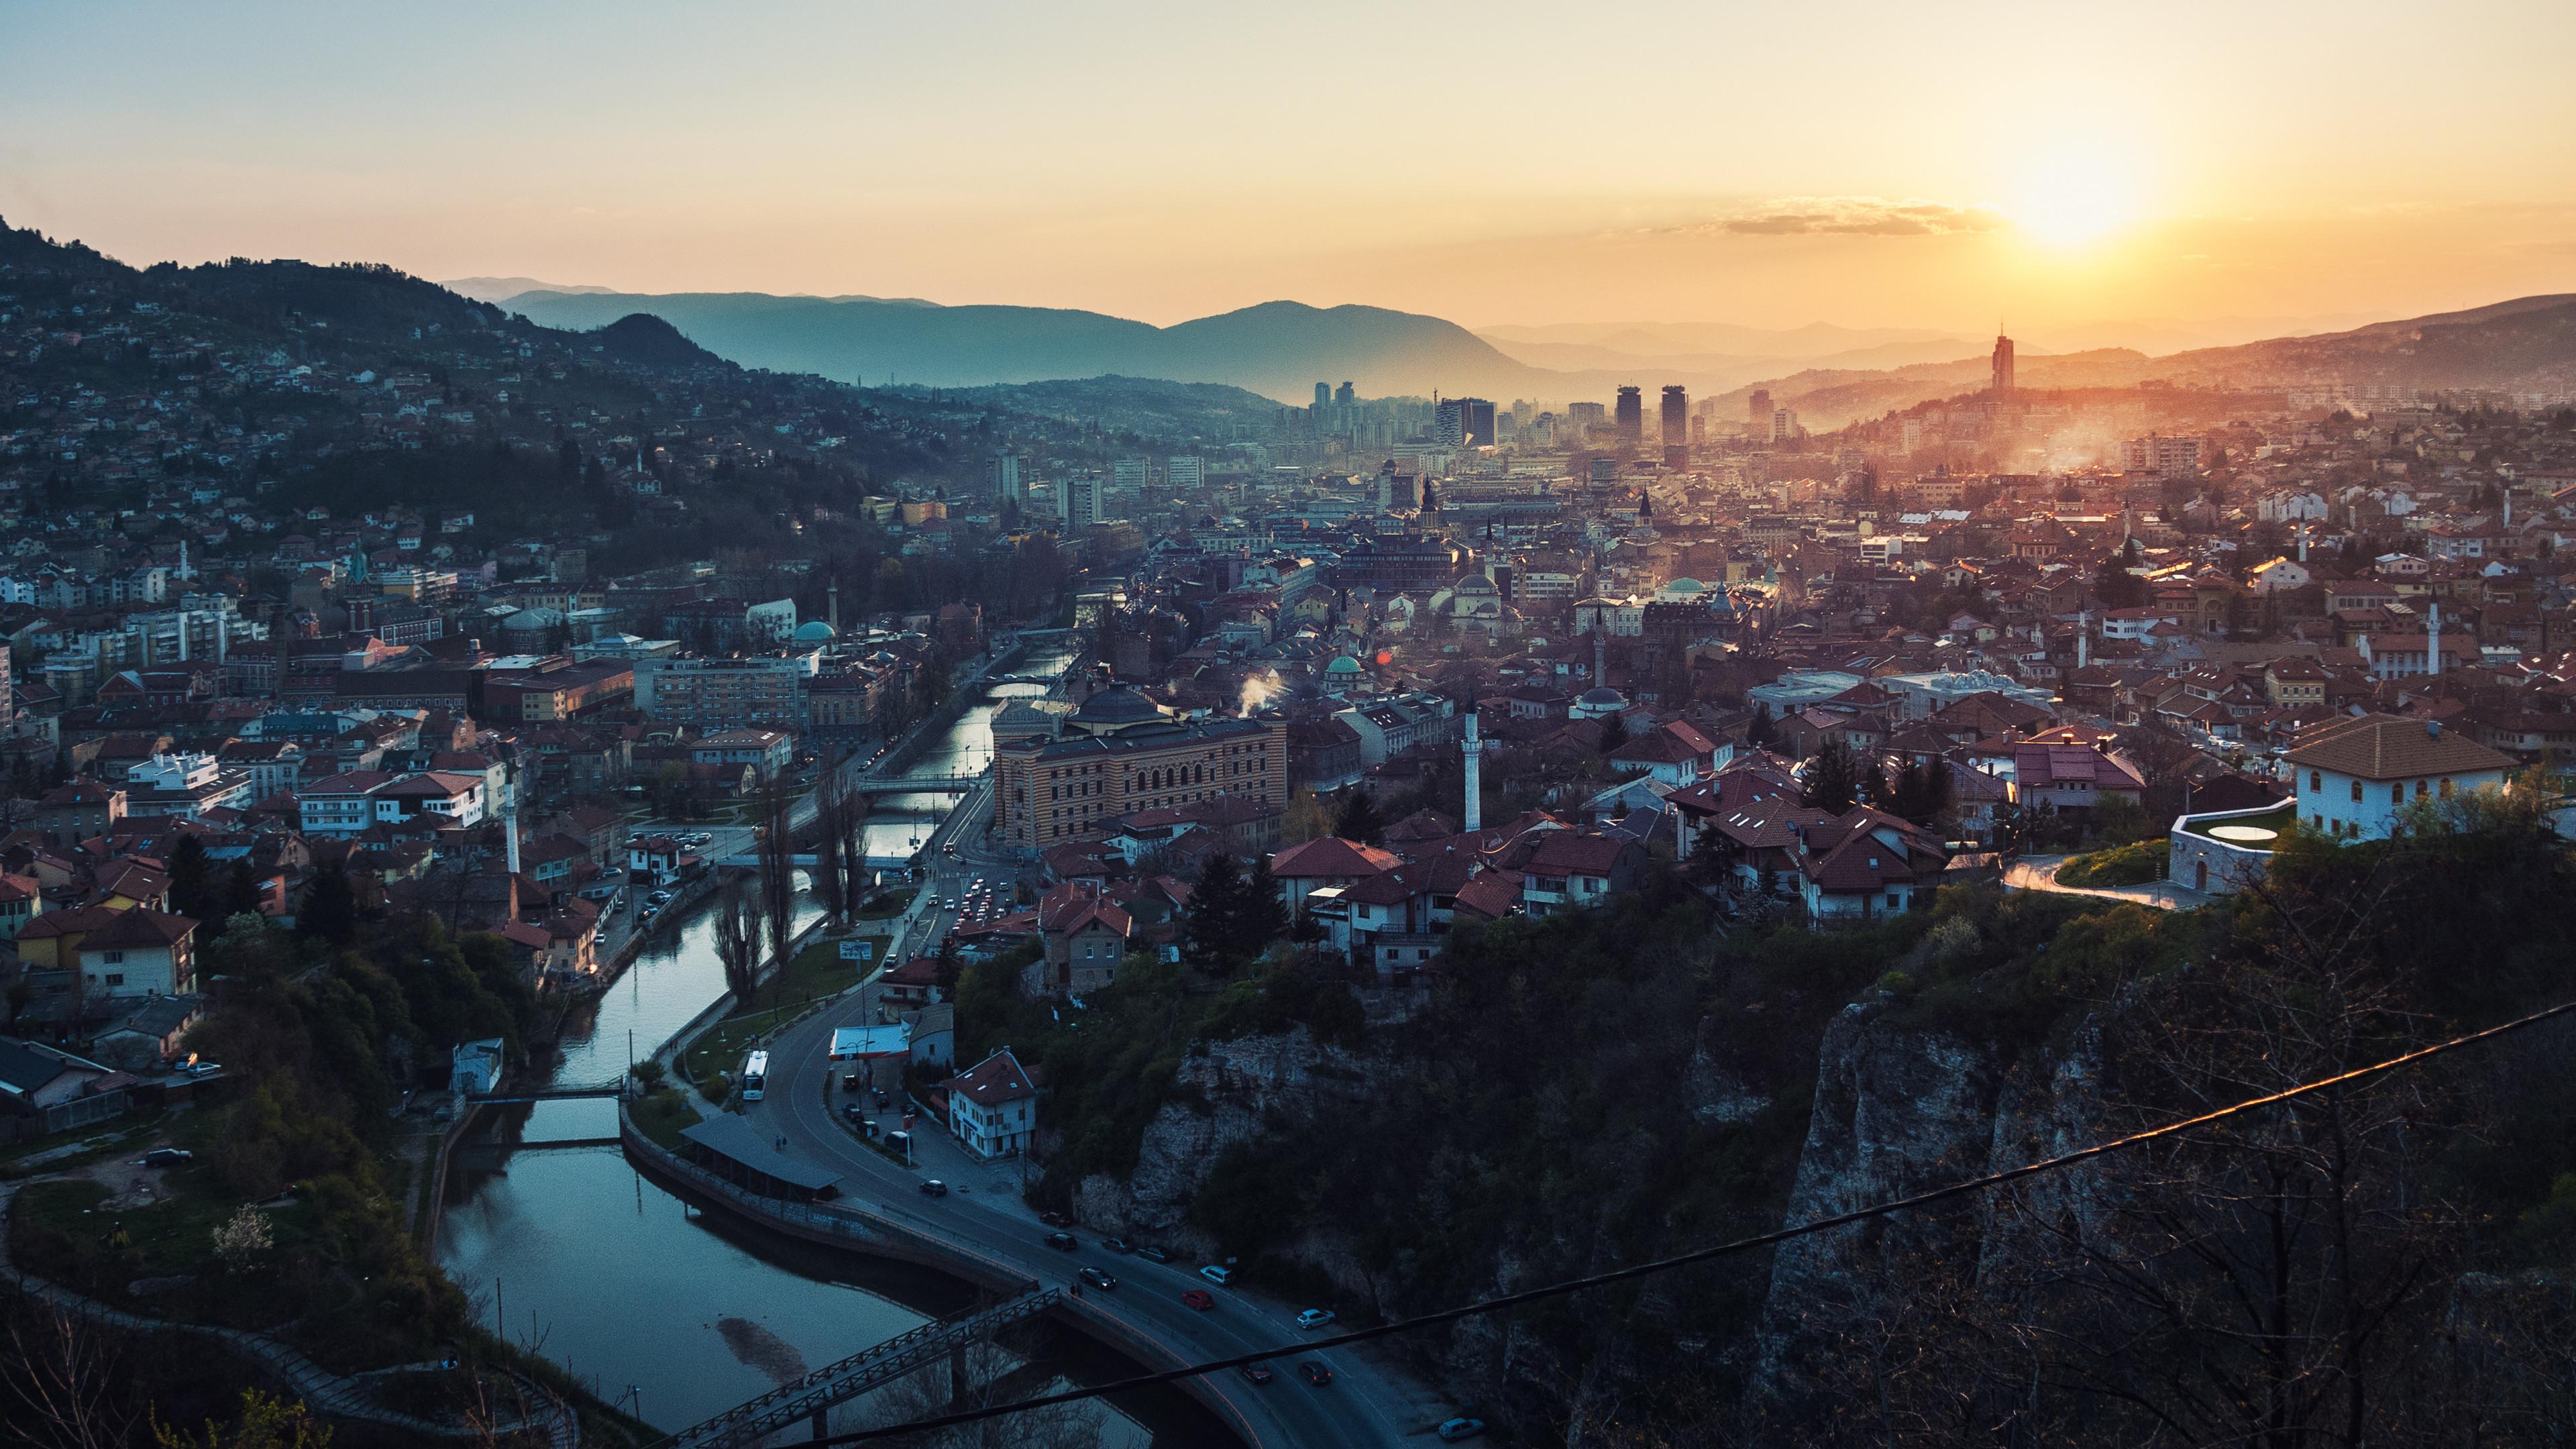 bosnia and herzegovina city 4k 1538069548 - Bosnia And Herzegovina City 4k - world wallpapers, photography wallpapers, hd-wallpapers, city wallpapers, 4k-wallpapers